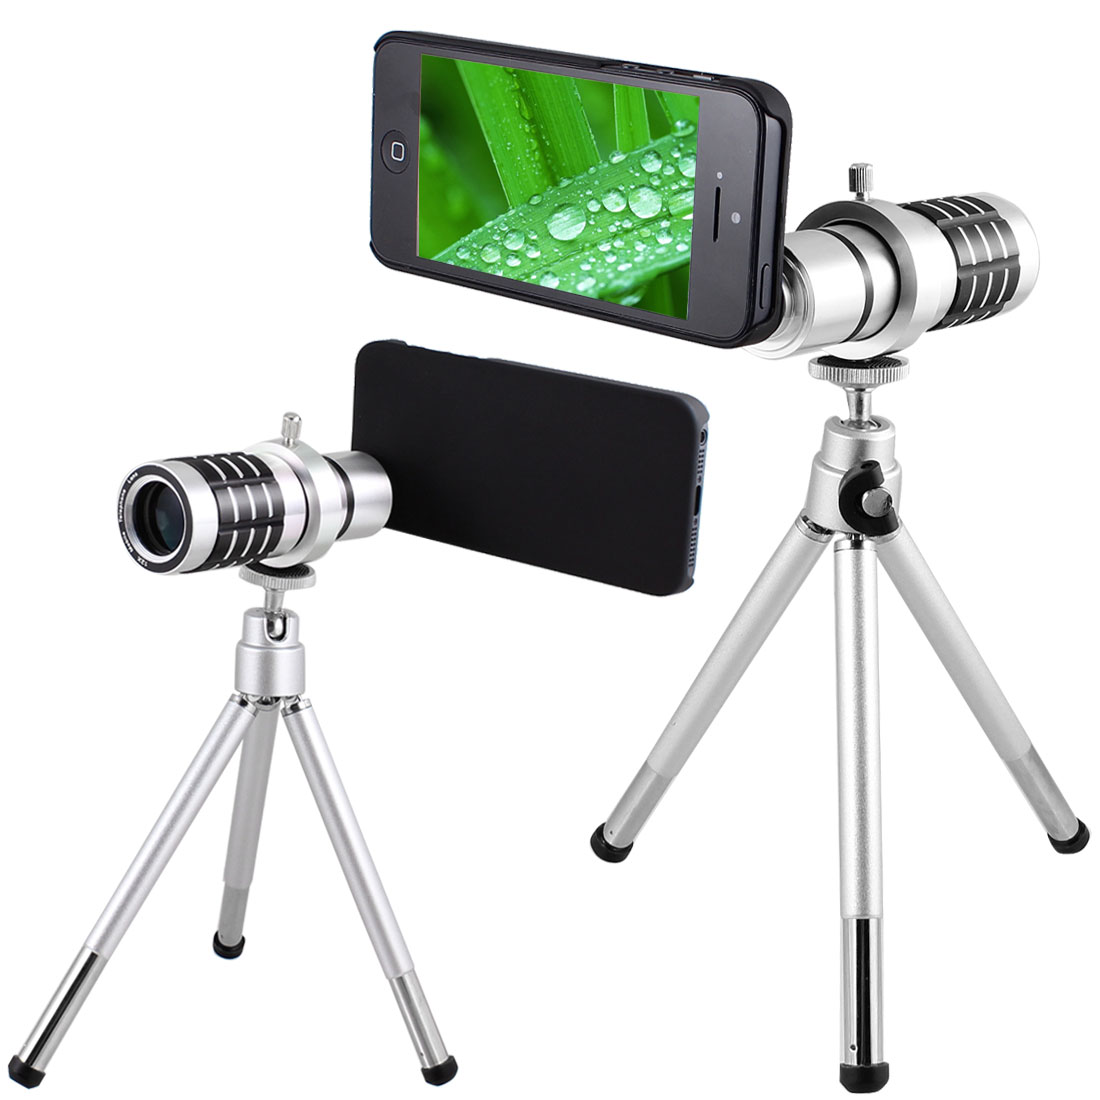 Zoom 12X Camera Telephoto Lens w Mini Tripod